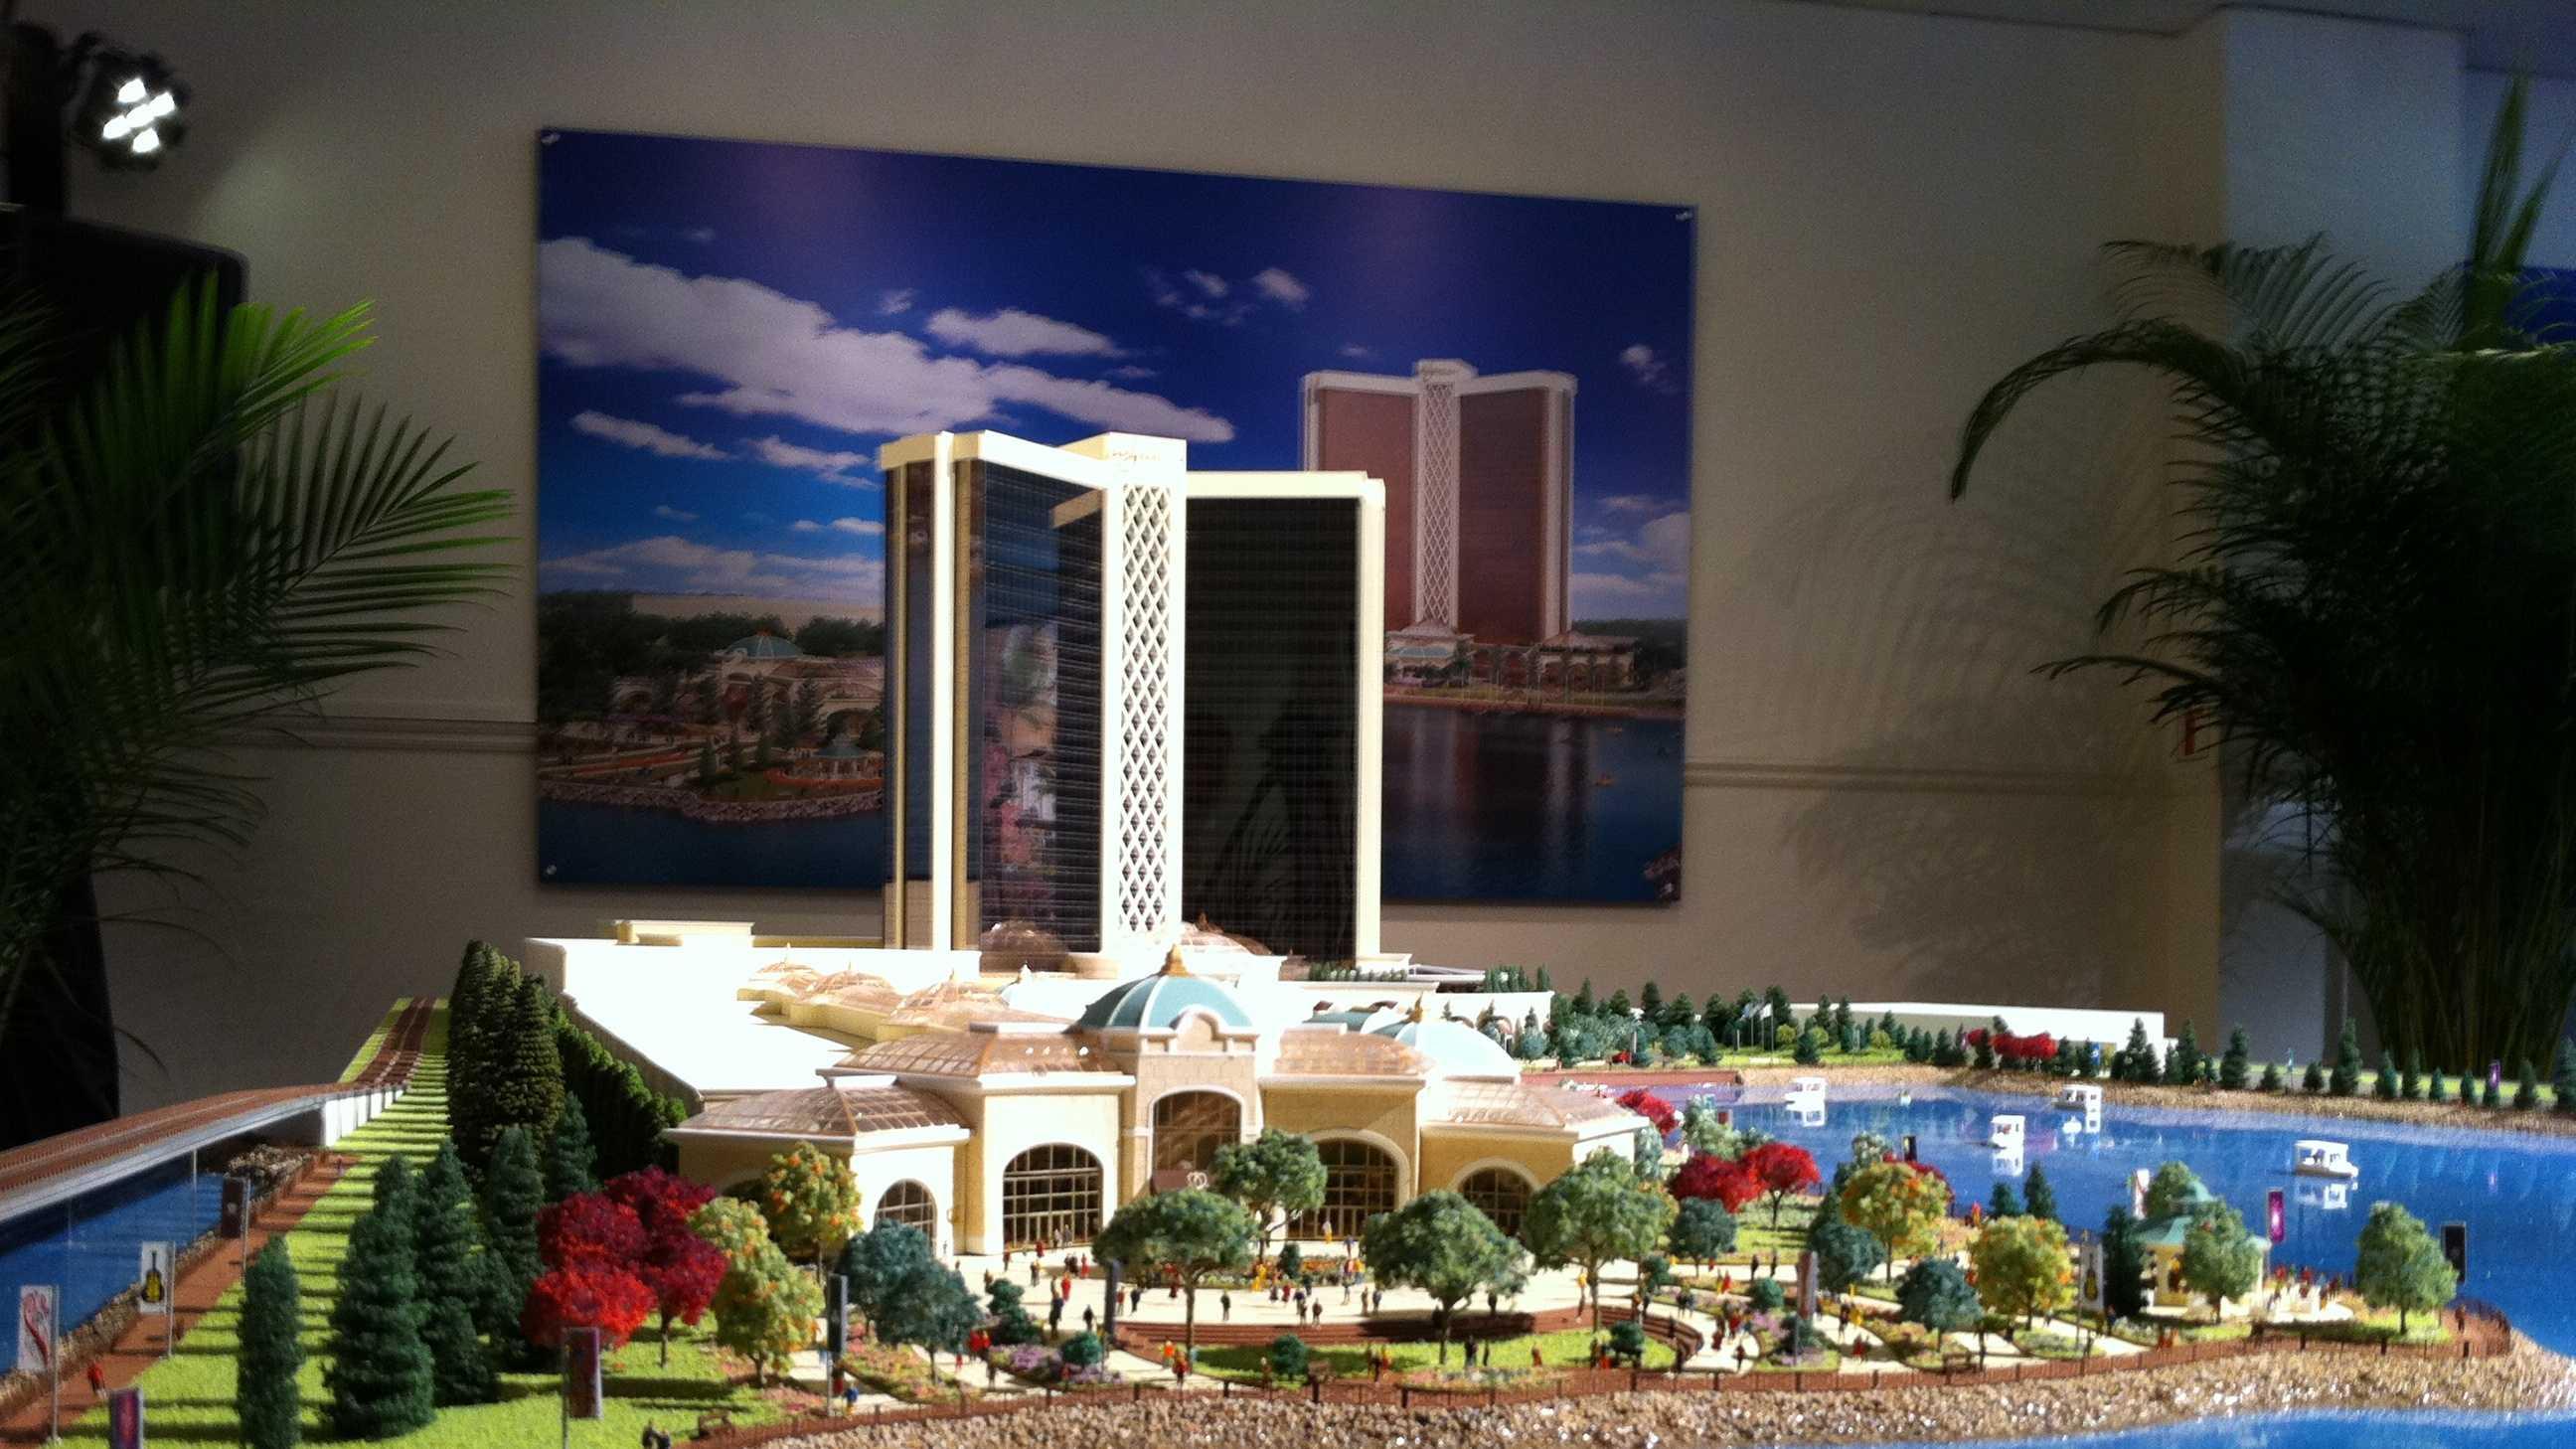 Wynn Casino Reveal 061313 01.JPG